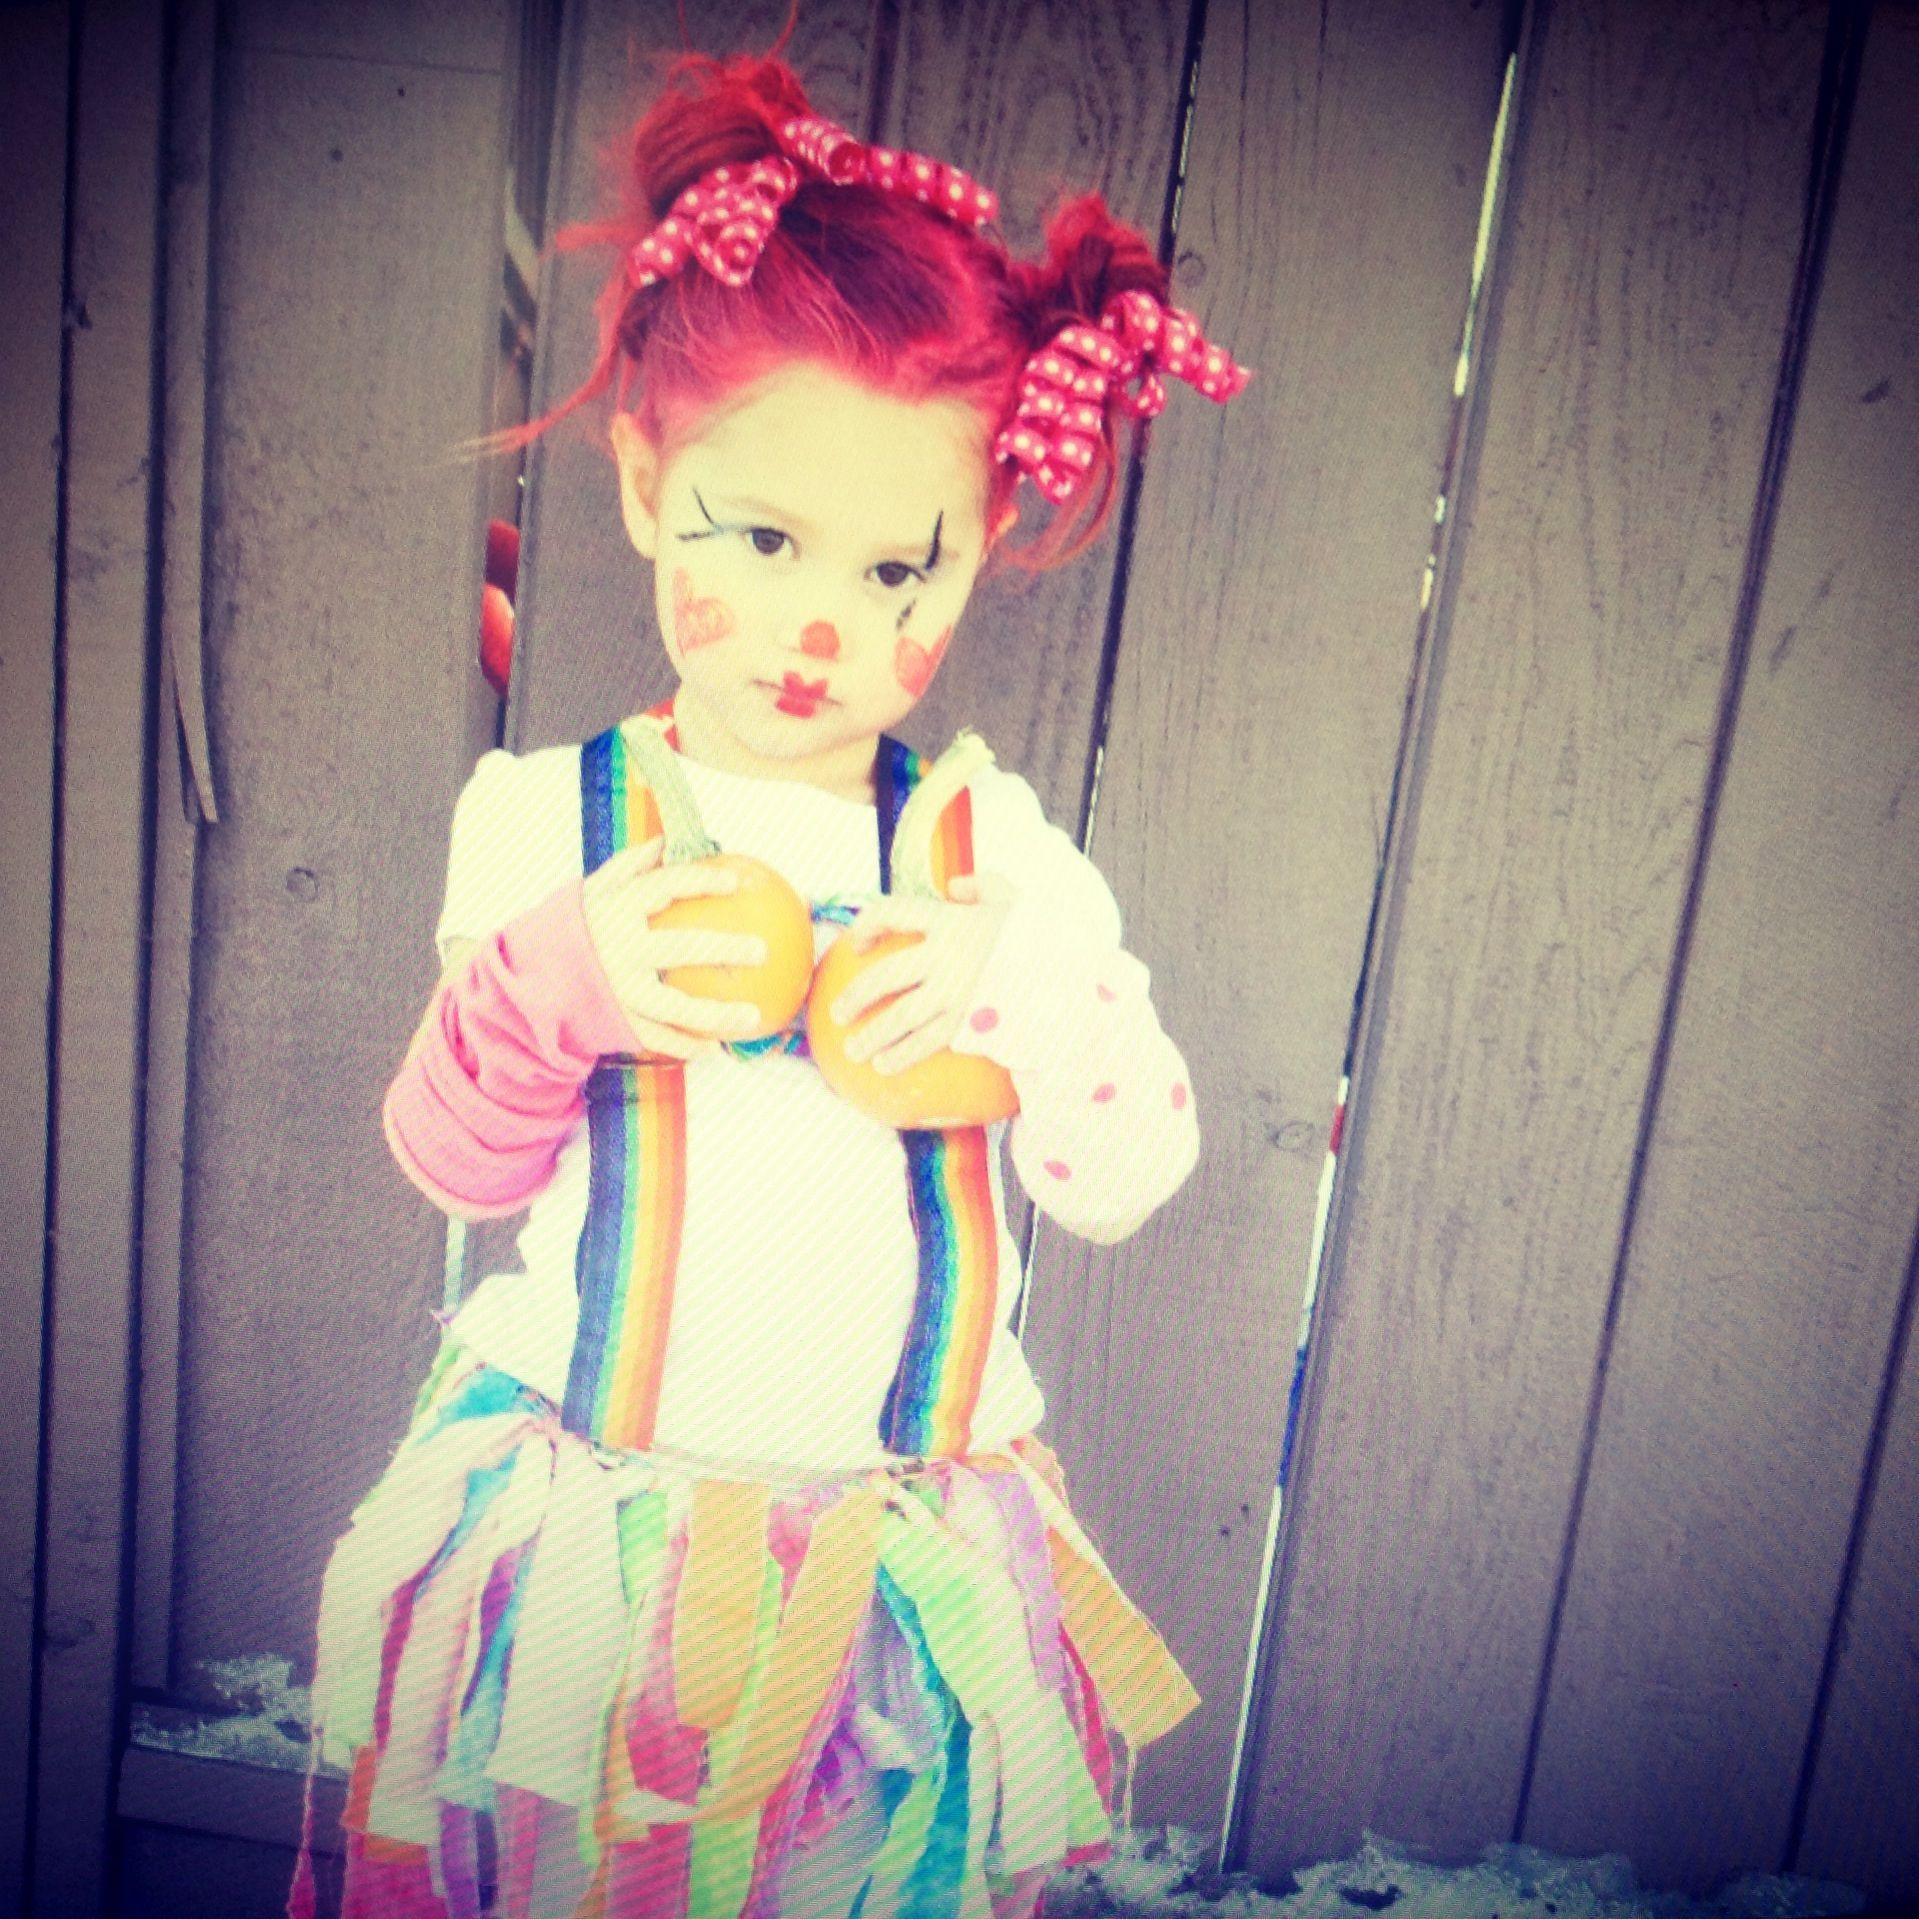 halloween 2013 little girl clown costume little girl costume - Girl Clown Halloween Costumes